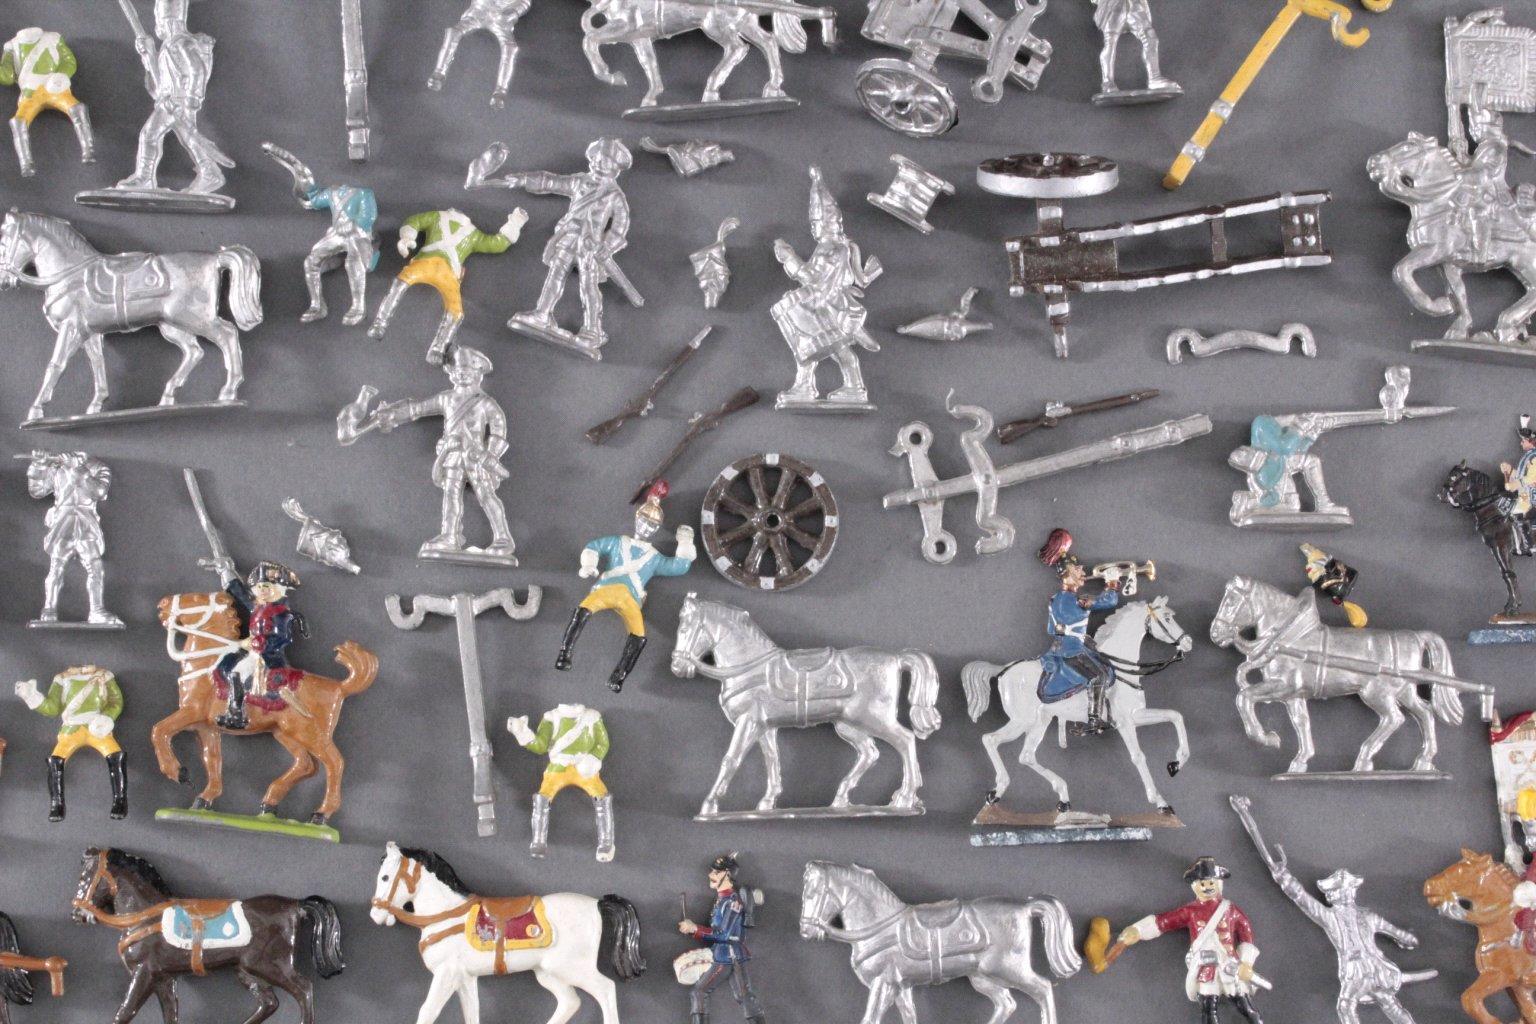 Sammlung Zinnfiguren, weit über 60 Stück-3